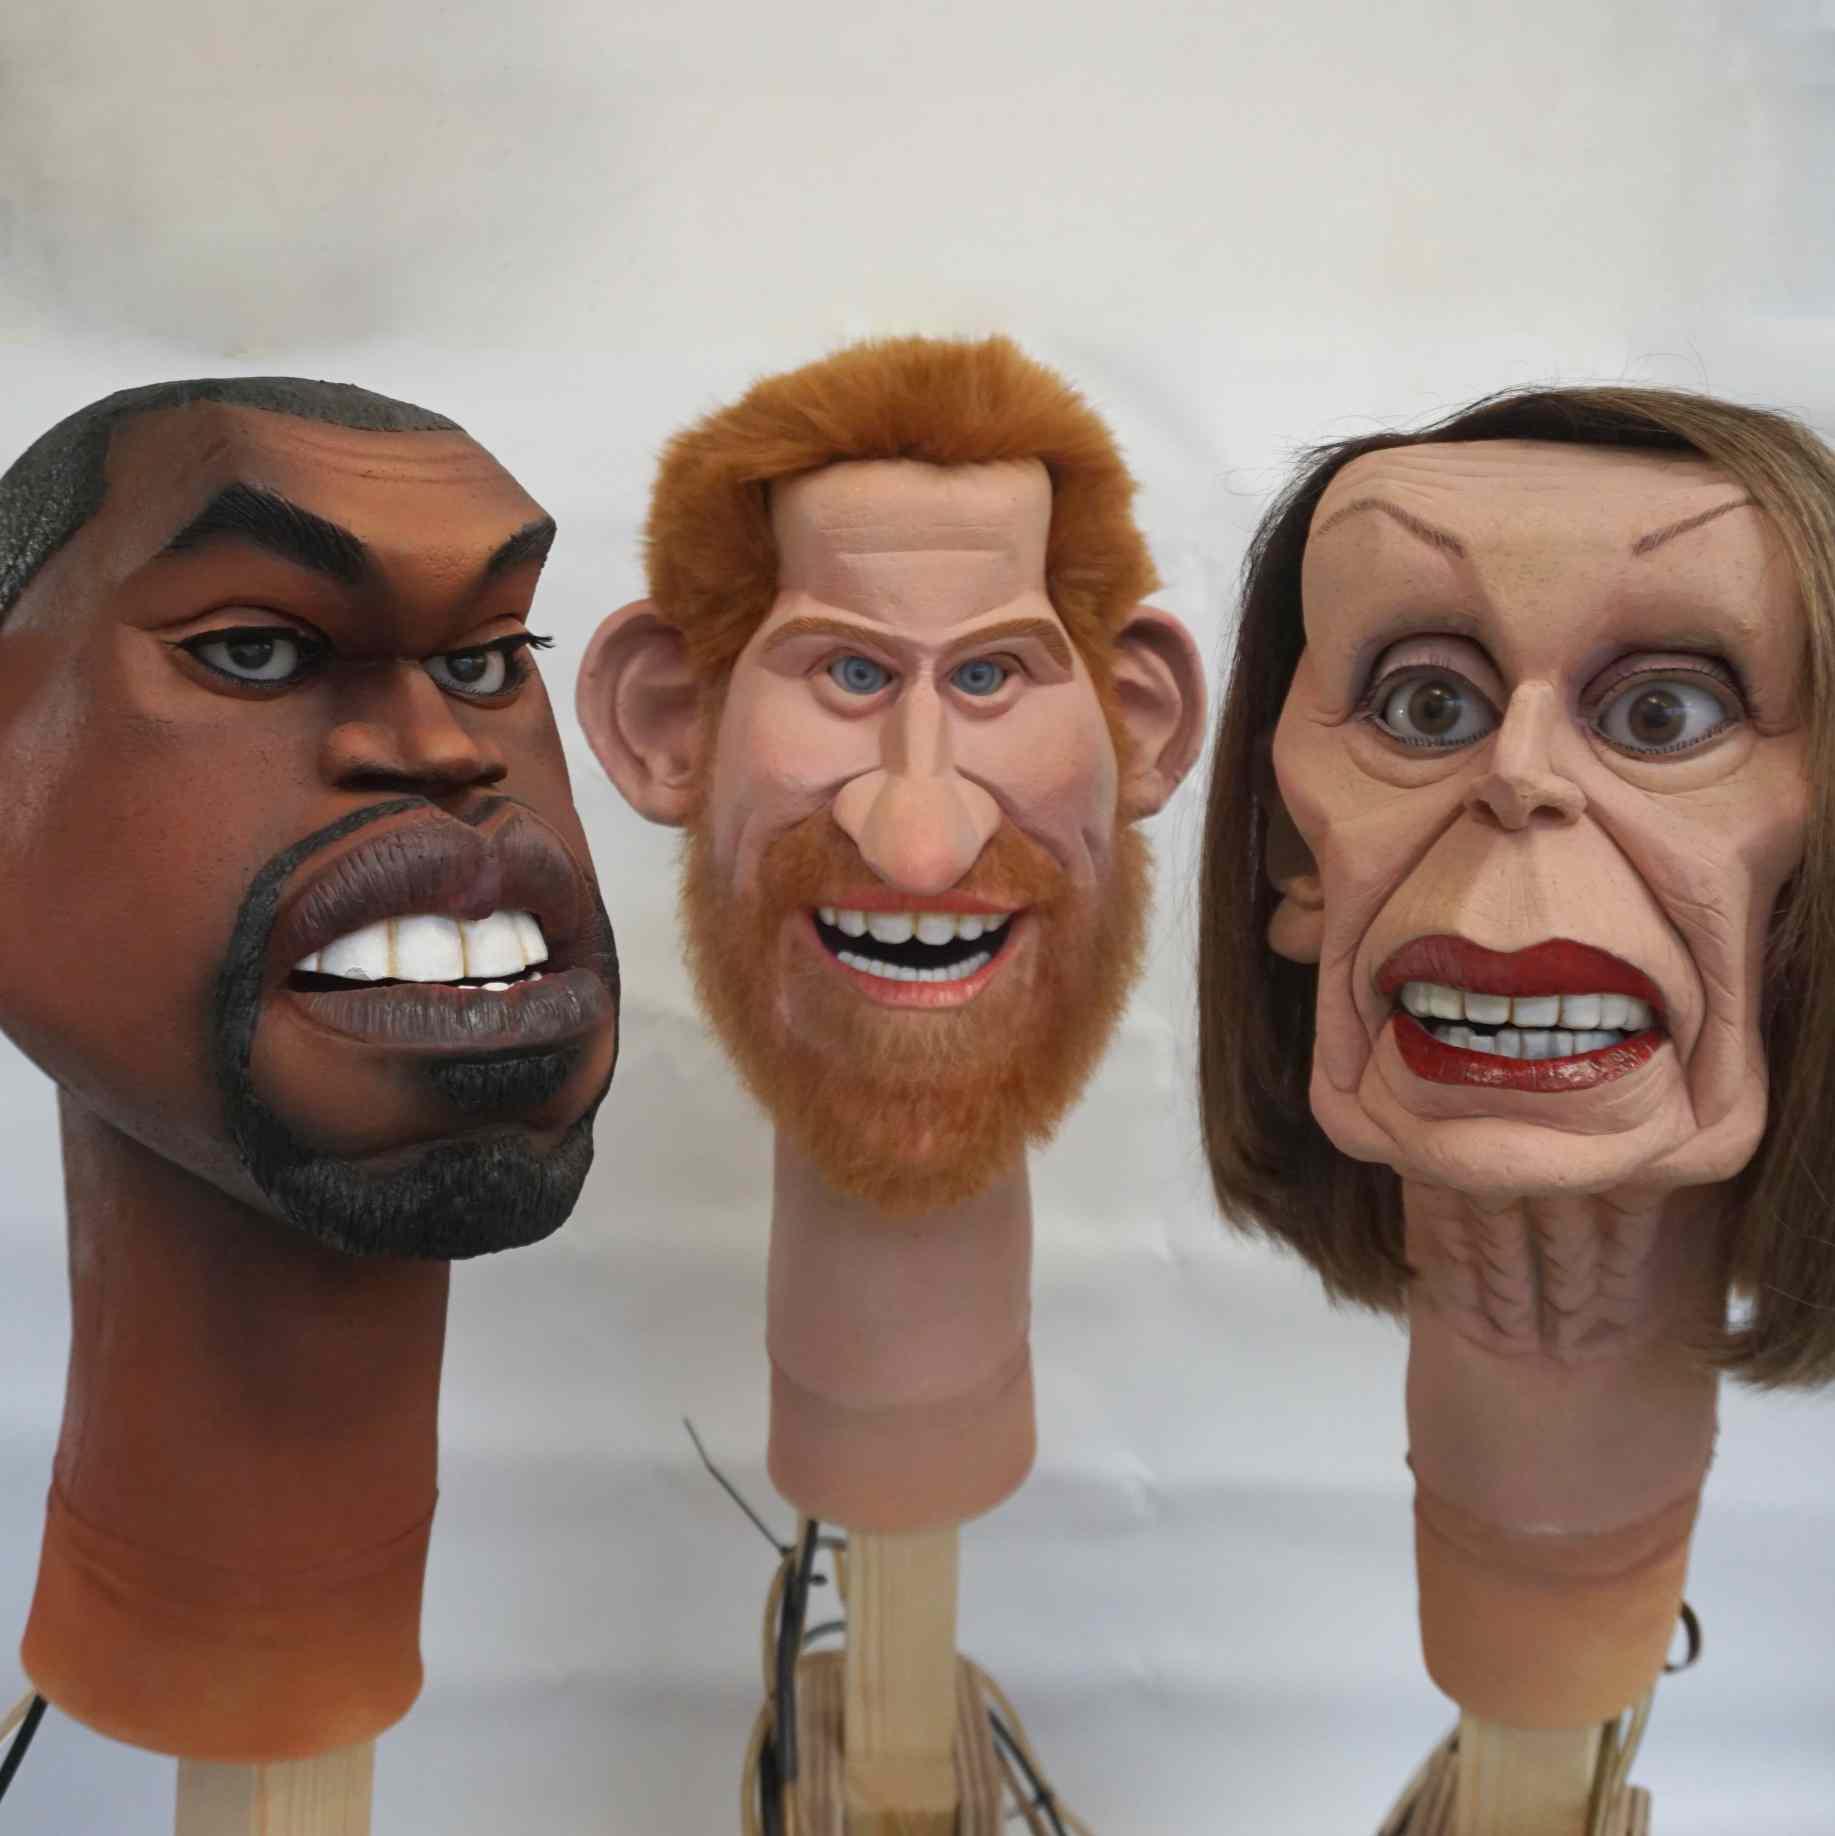 Puppet head Spitting Image